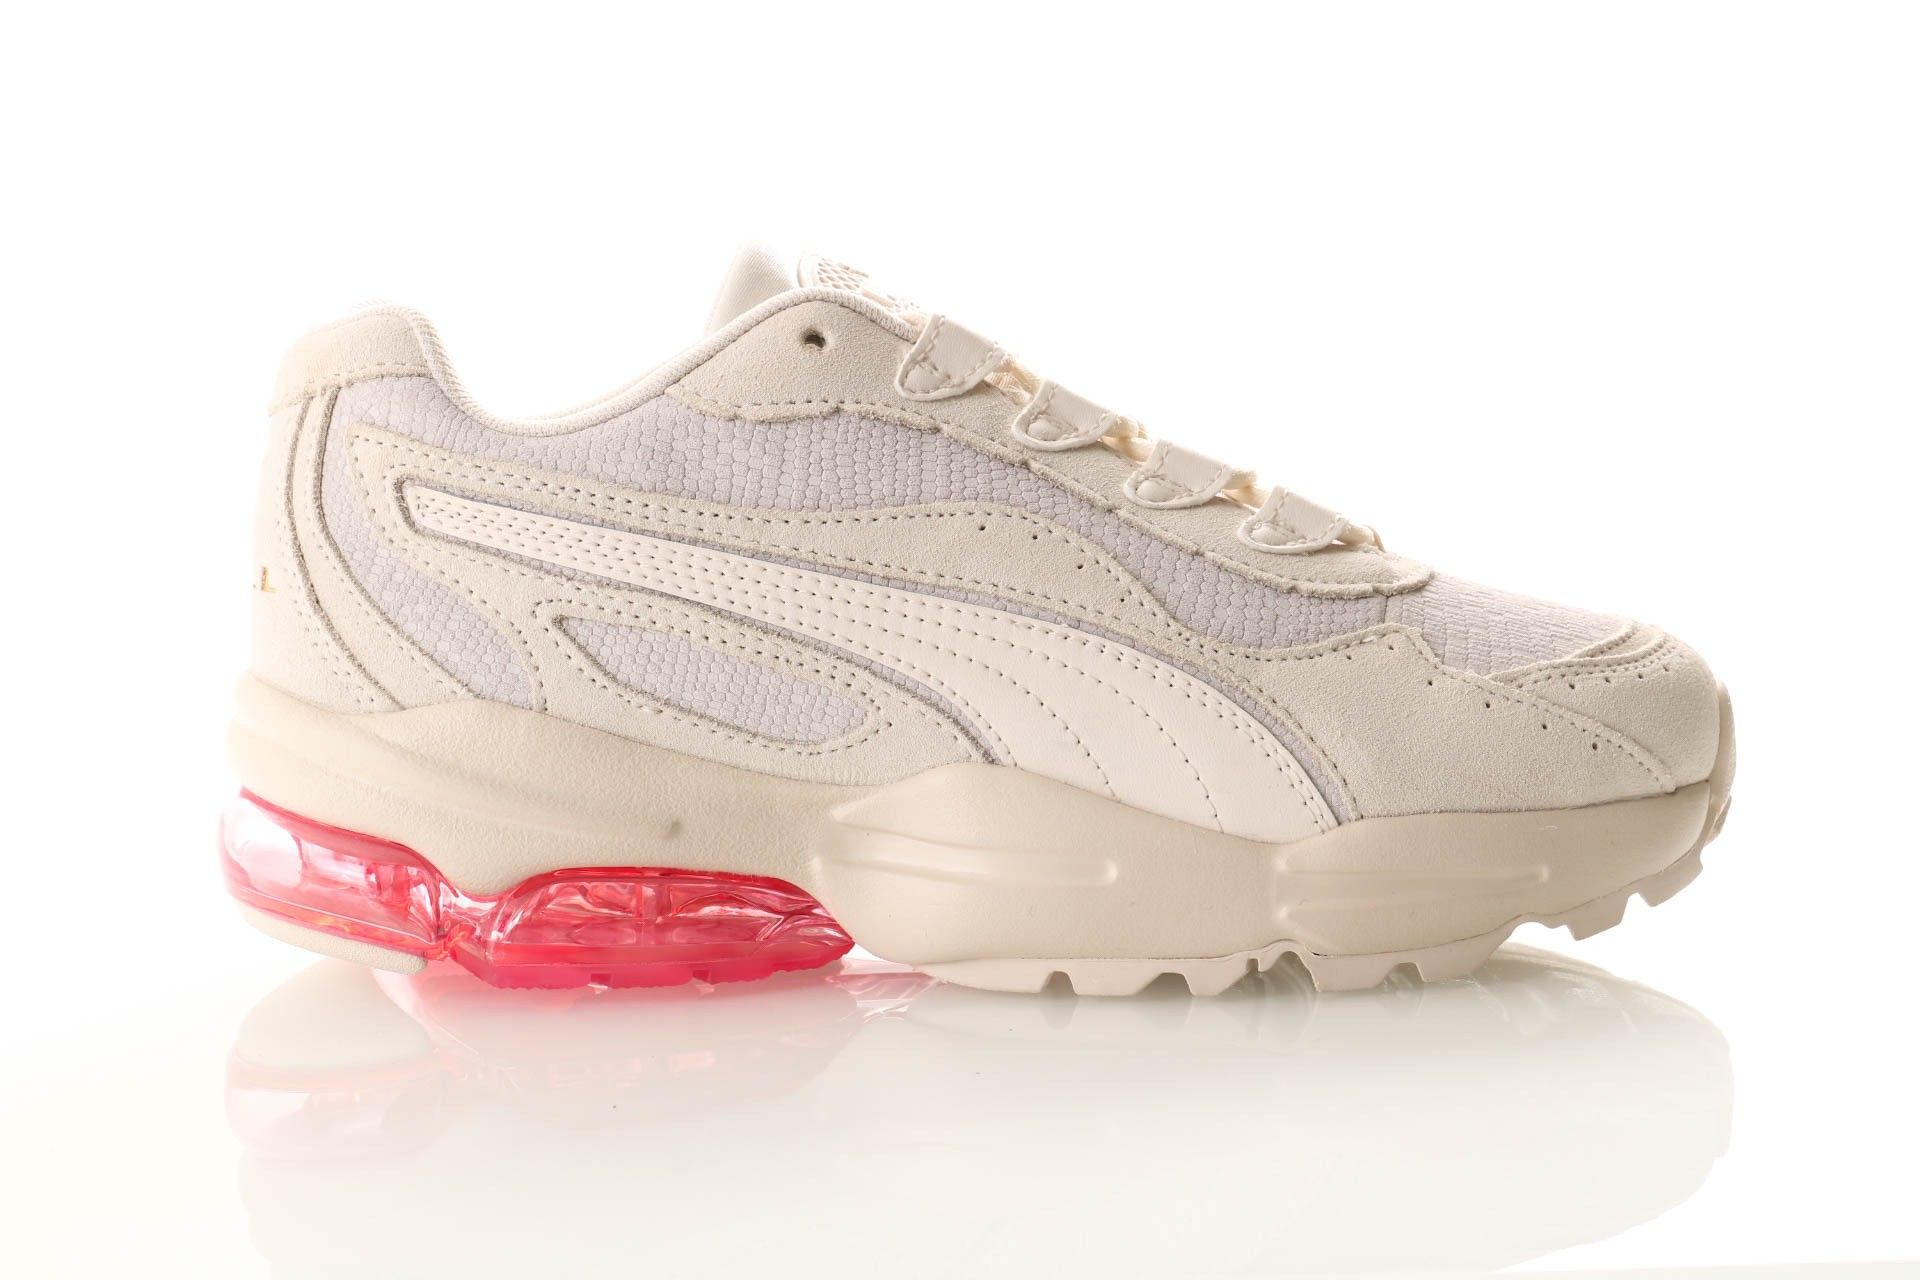 Afbeelding van Puma Cell Stellar Tonal Wn S 370951 01 Sneakers Marshmallow-Puma Team Gold